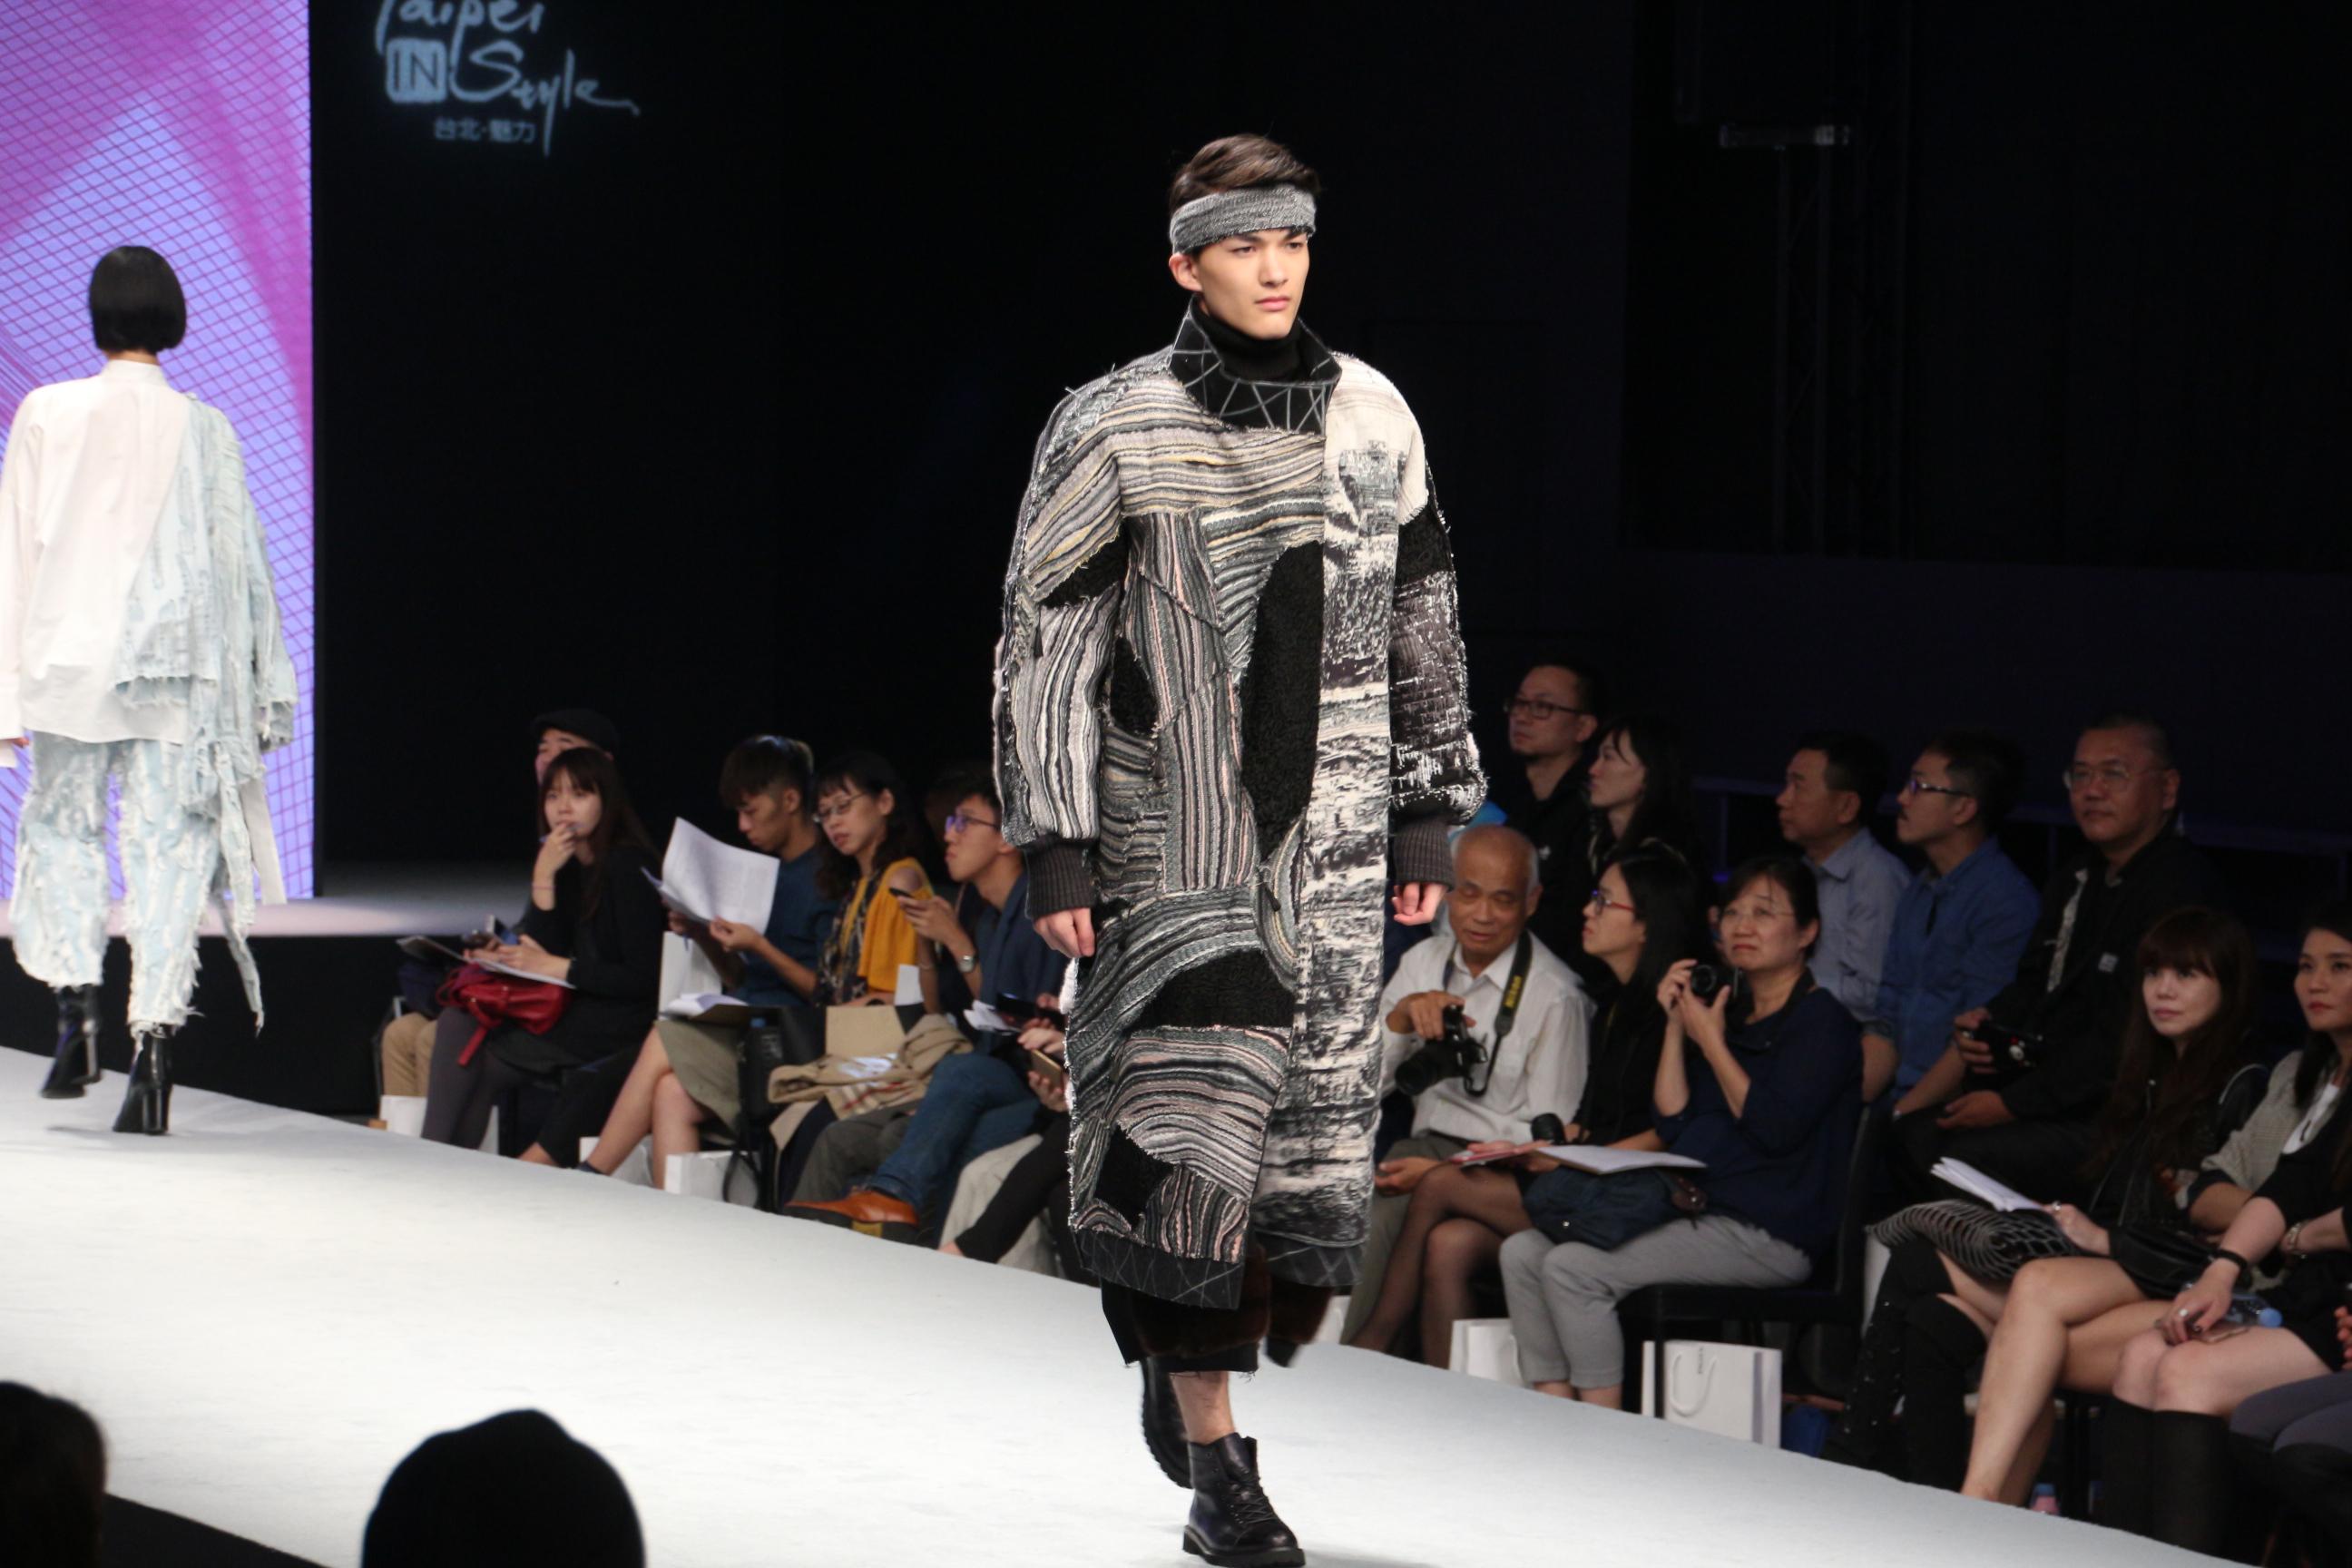 Taipei IN Style runway teaser marks beginning of fashion weekend